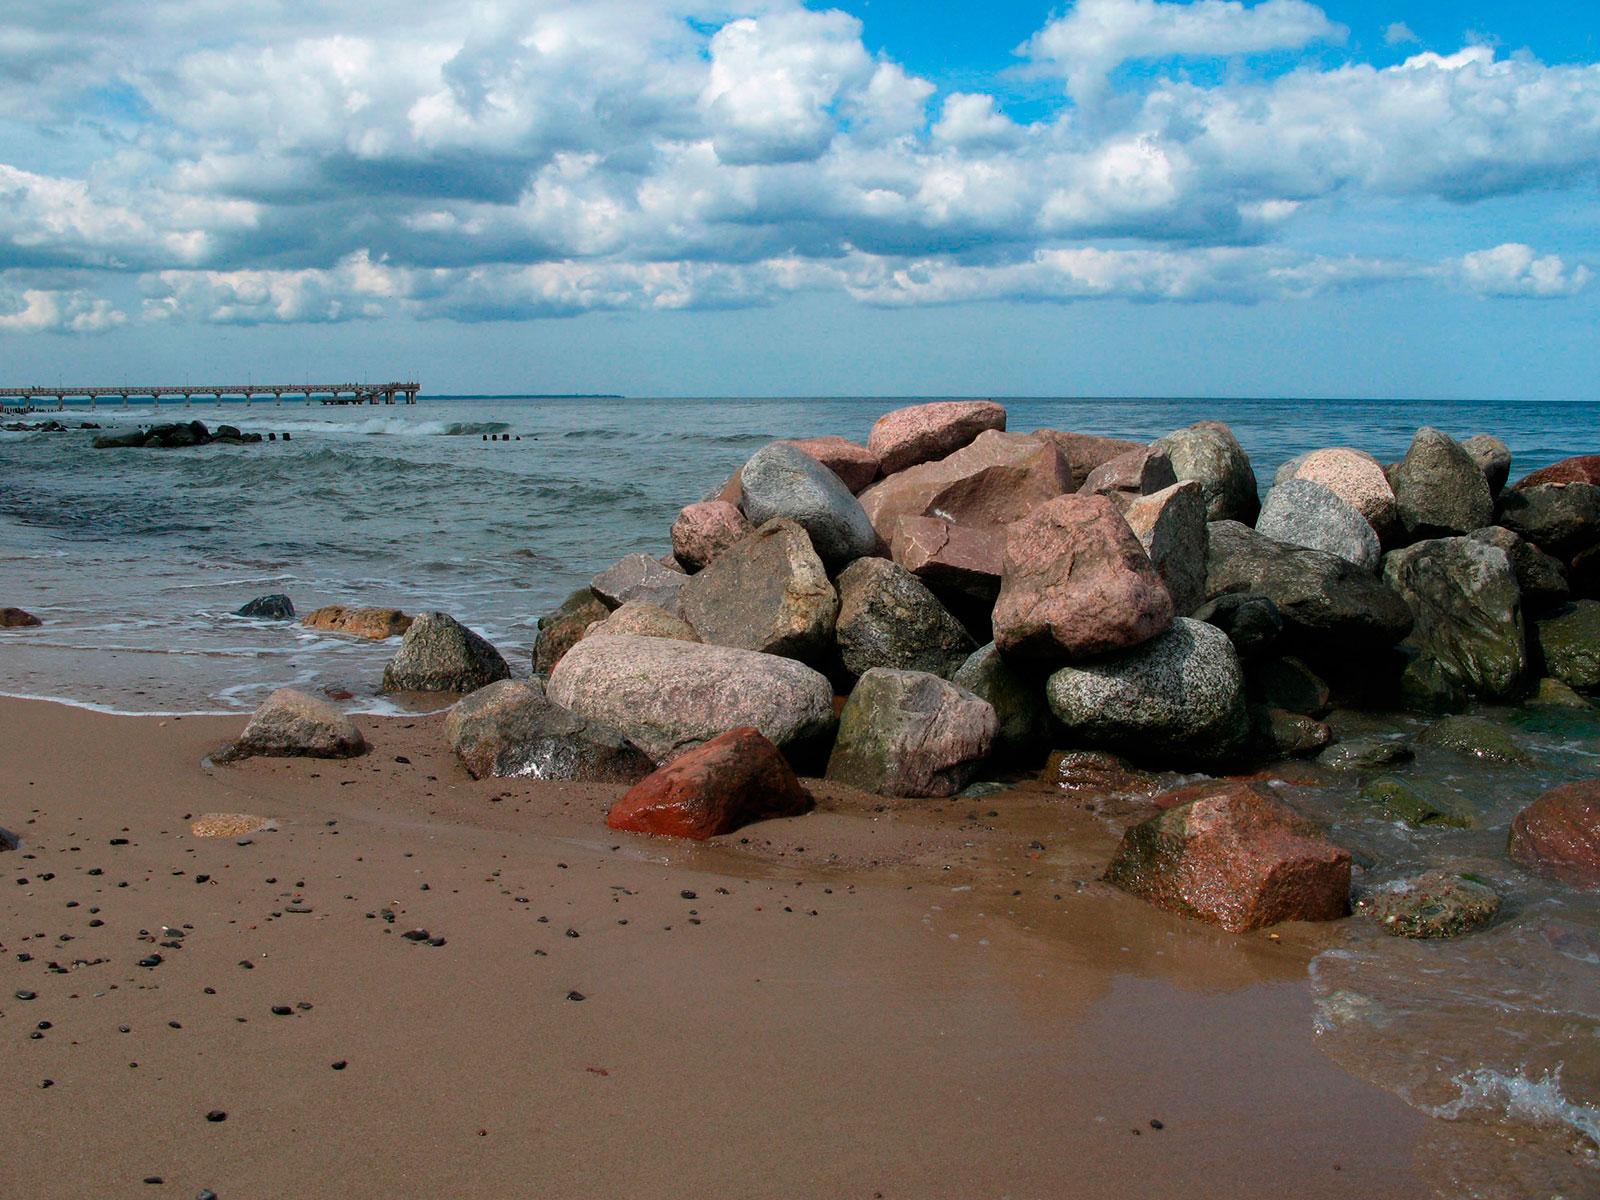 Балтийское море, белый песок и камни